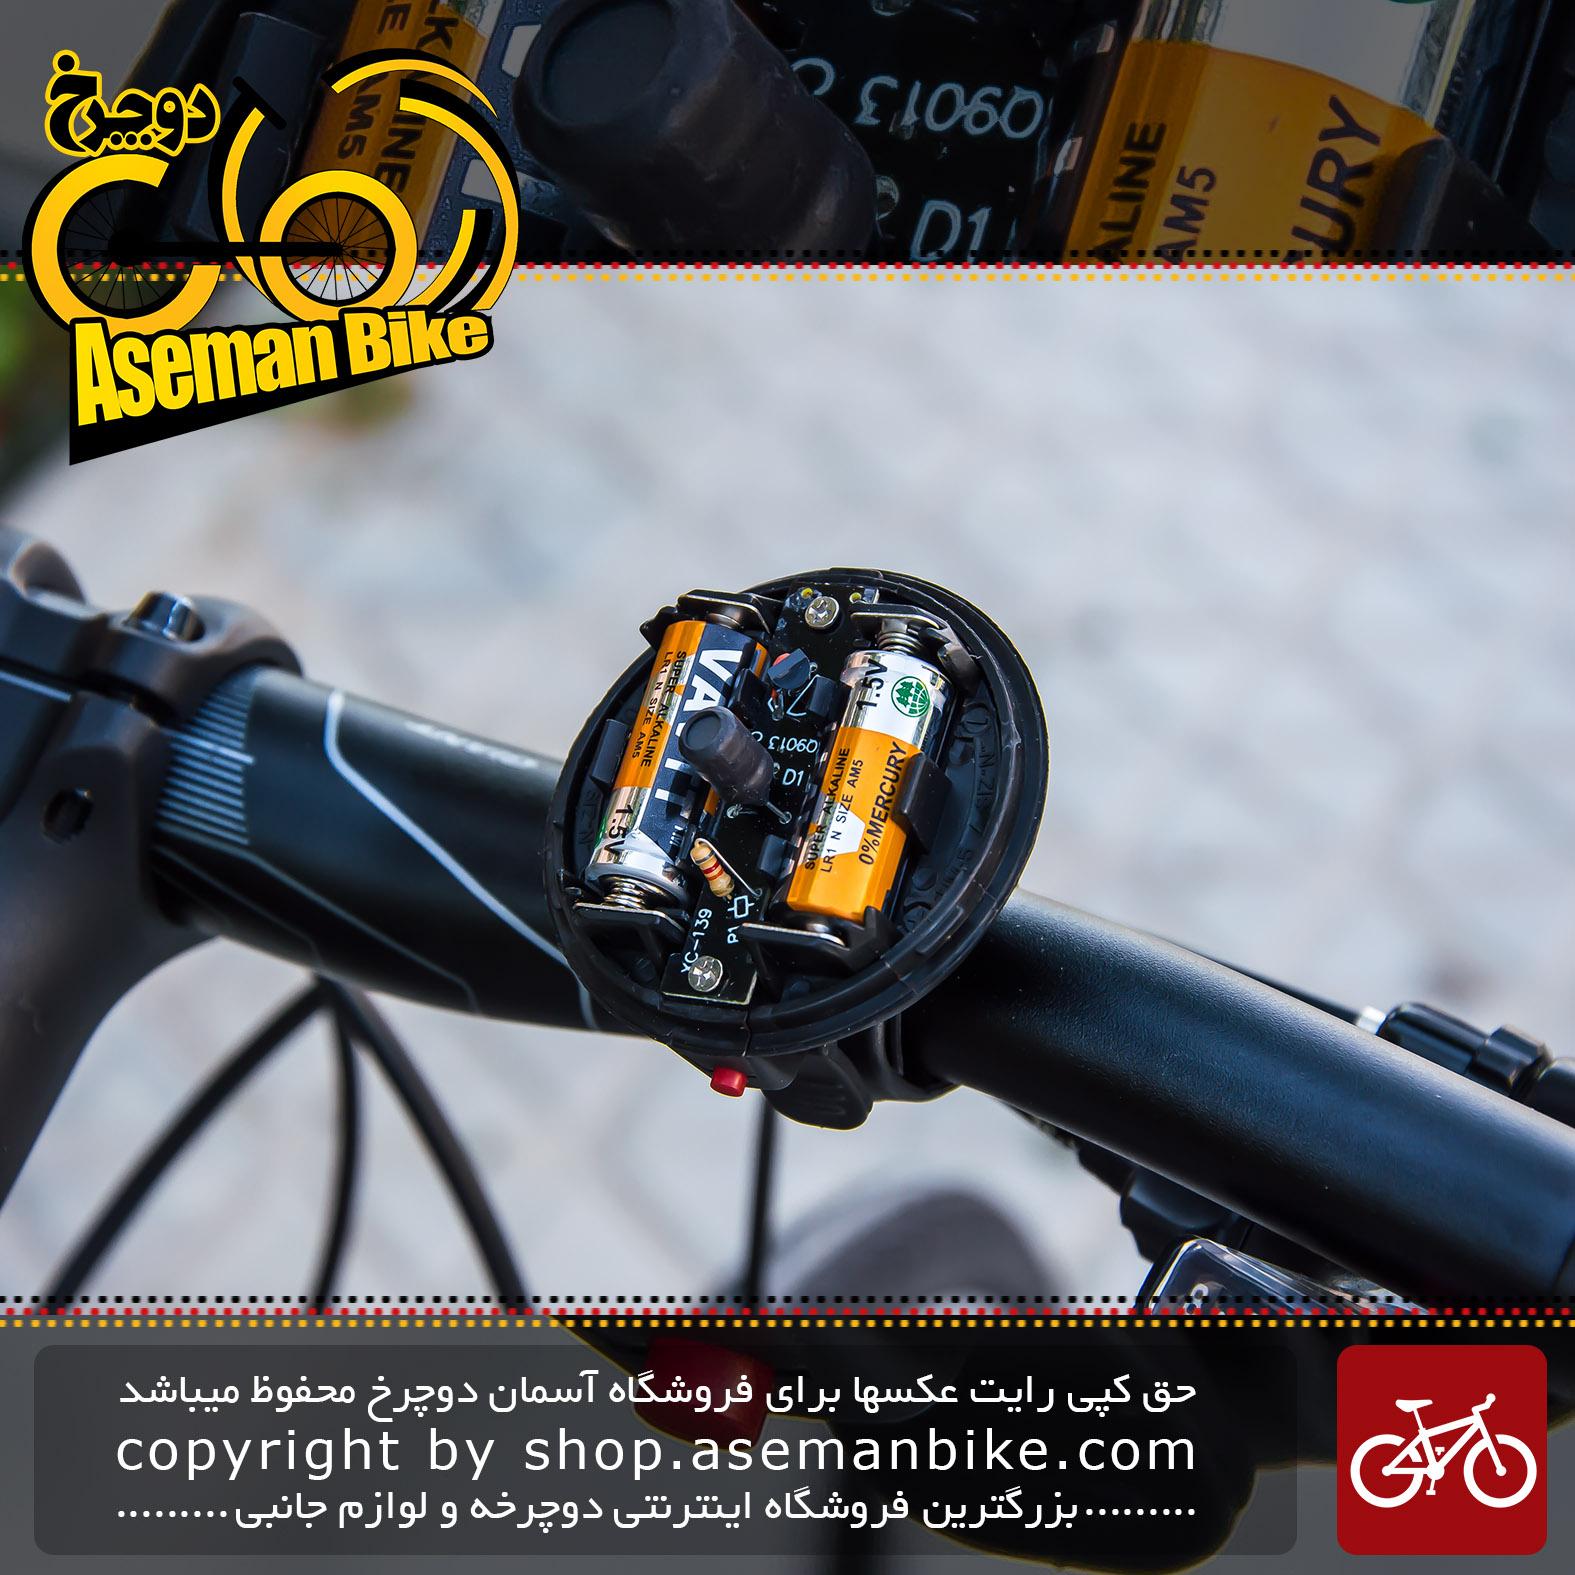 Xc 139 Bicycle Electronic Horn